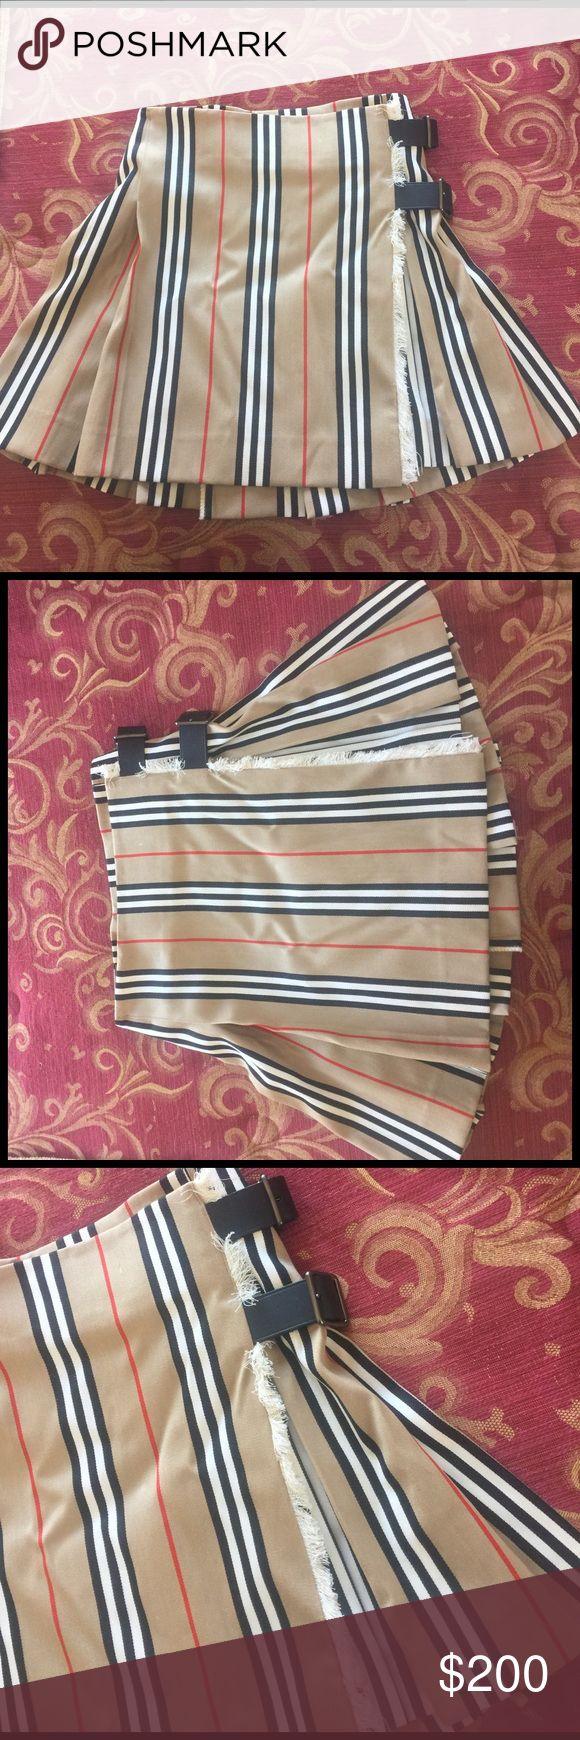 Burberry skirt Burberry skirt never worn, vintage, still has tag Burberry Skirts Mini